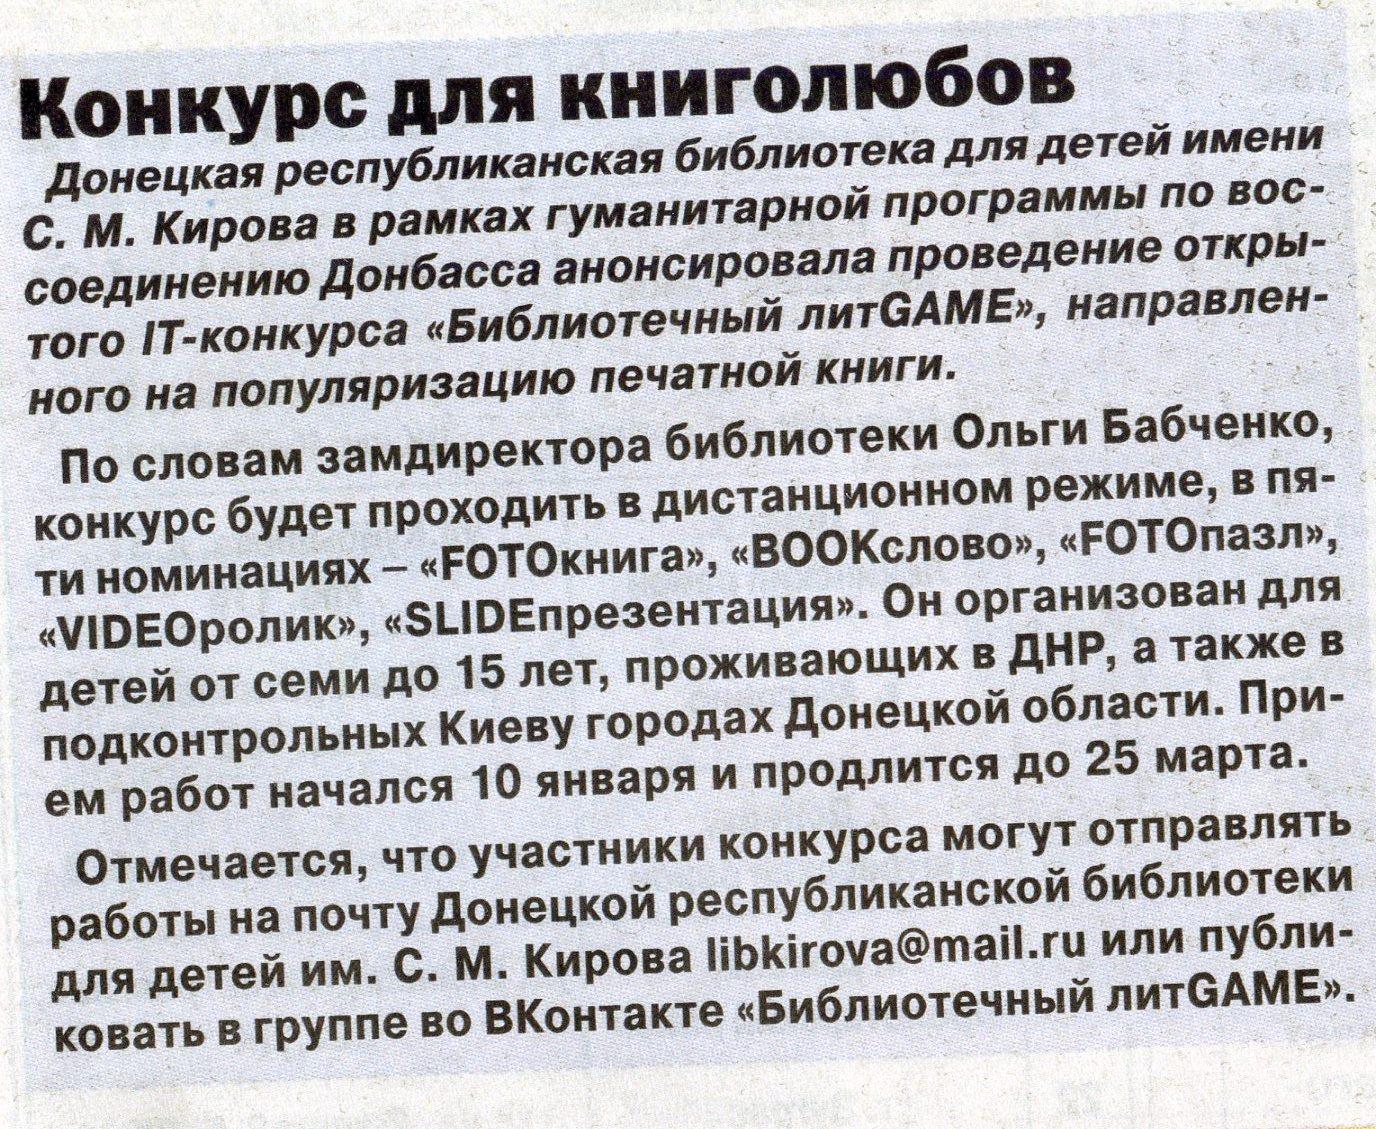 https://img-fotki.yandex.ru/get/766807/288729356.1cd/0_1f7a90_41223750_orig